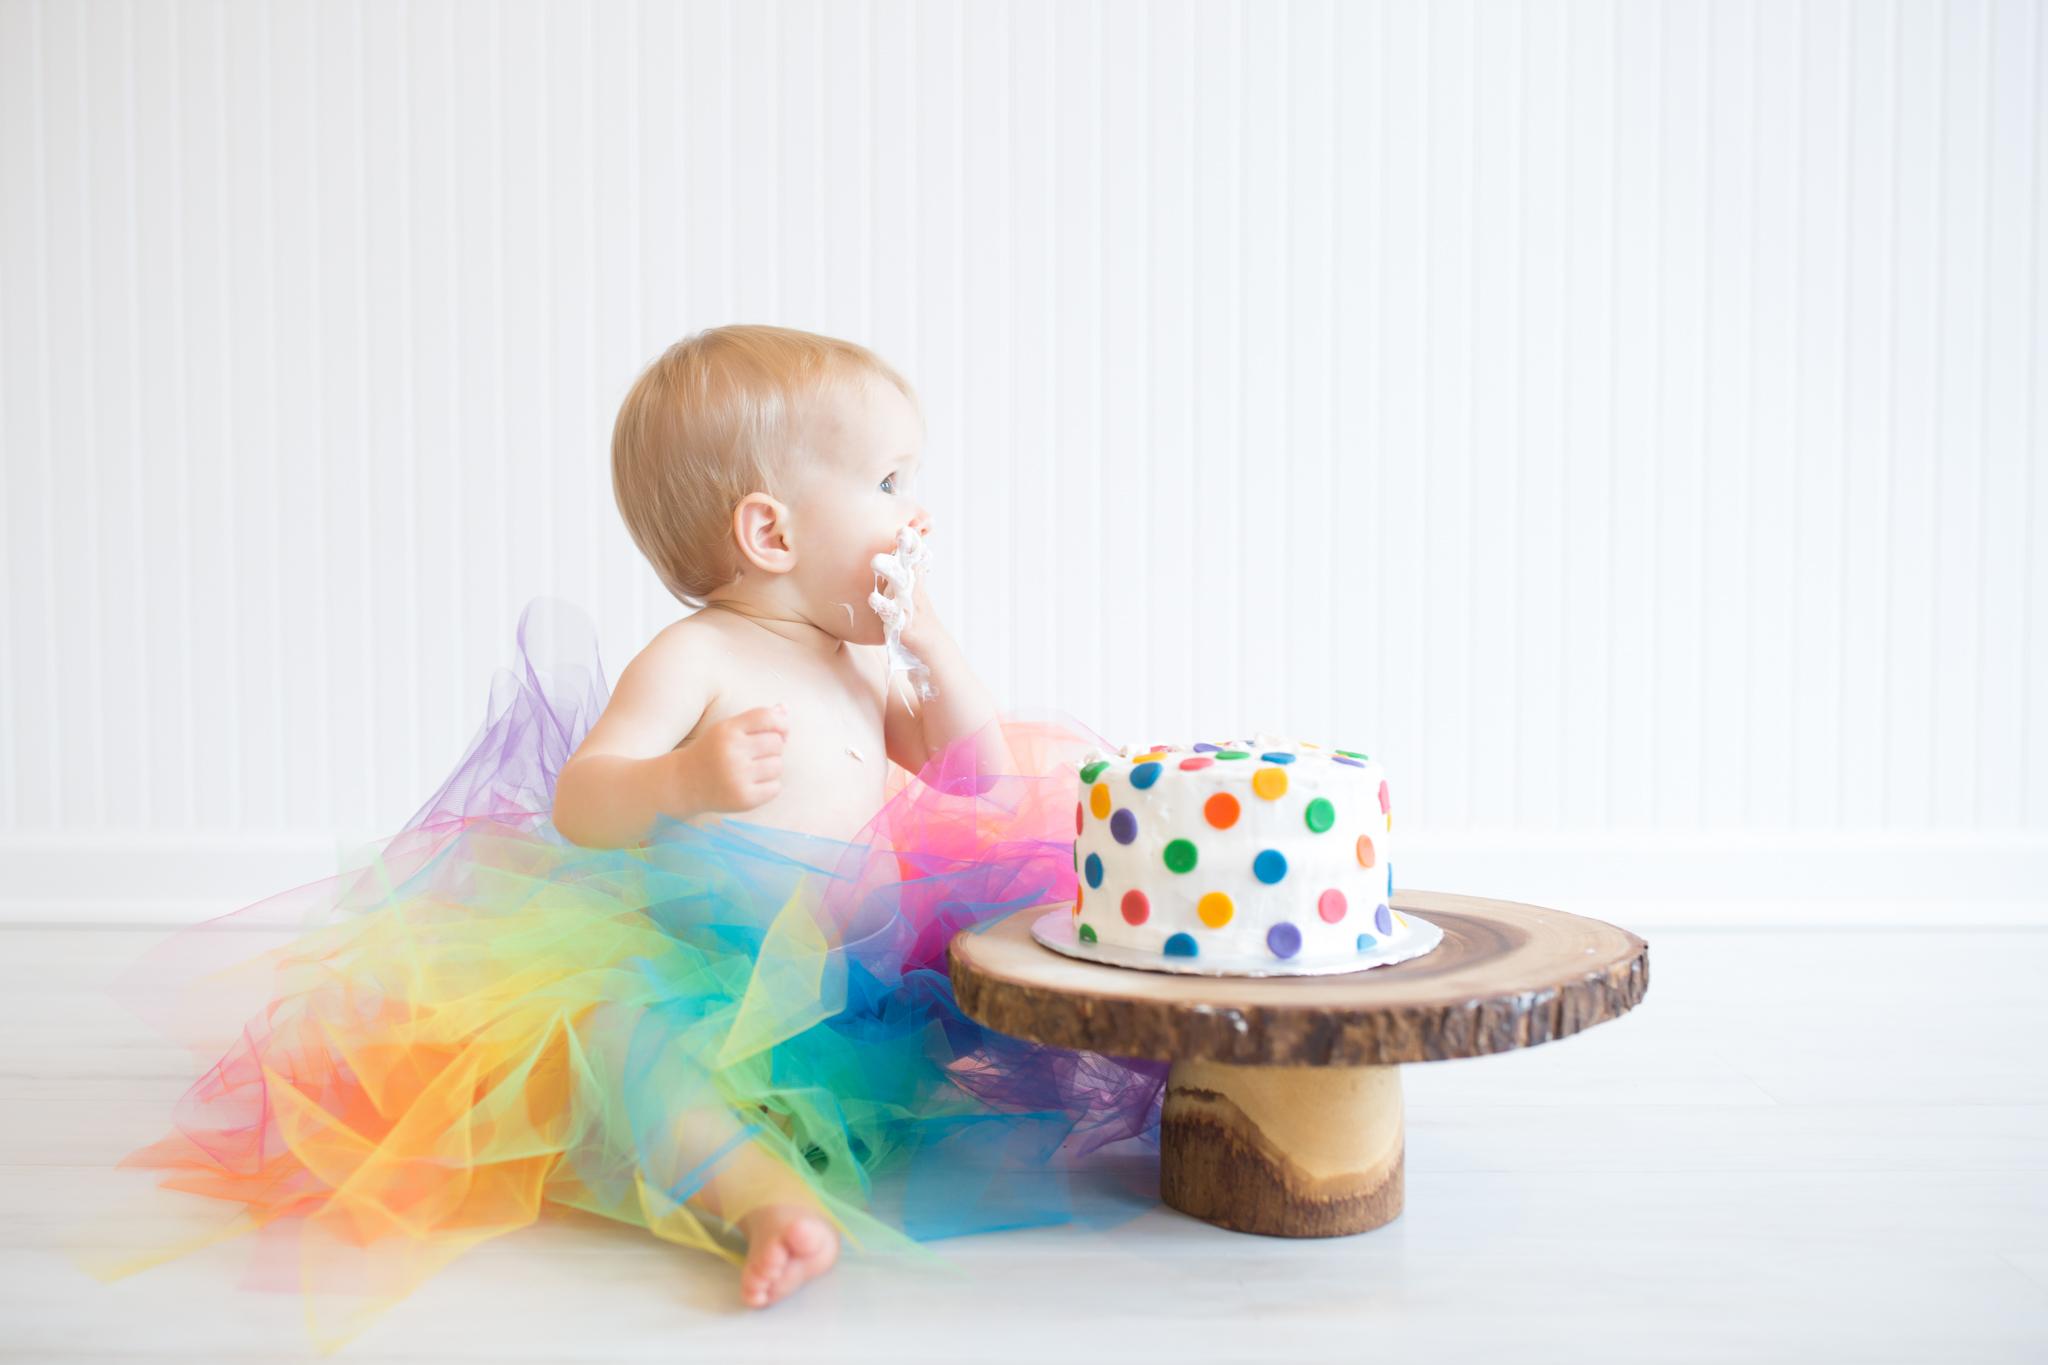 Milestone cake smash Newborn Studio Session | Cara Peterson Photography Rockford IL-13.jpg